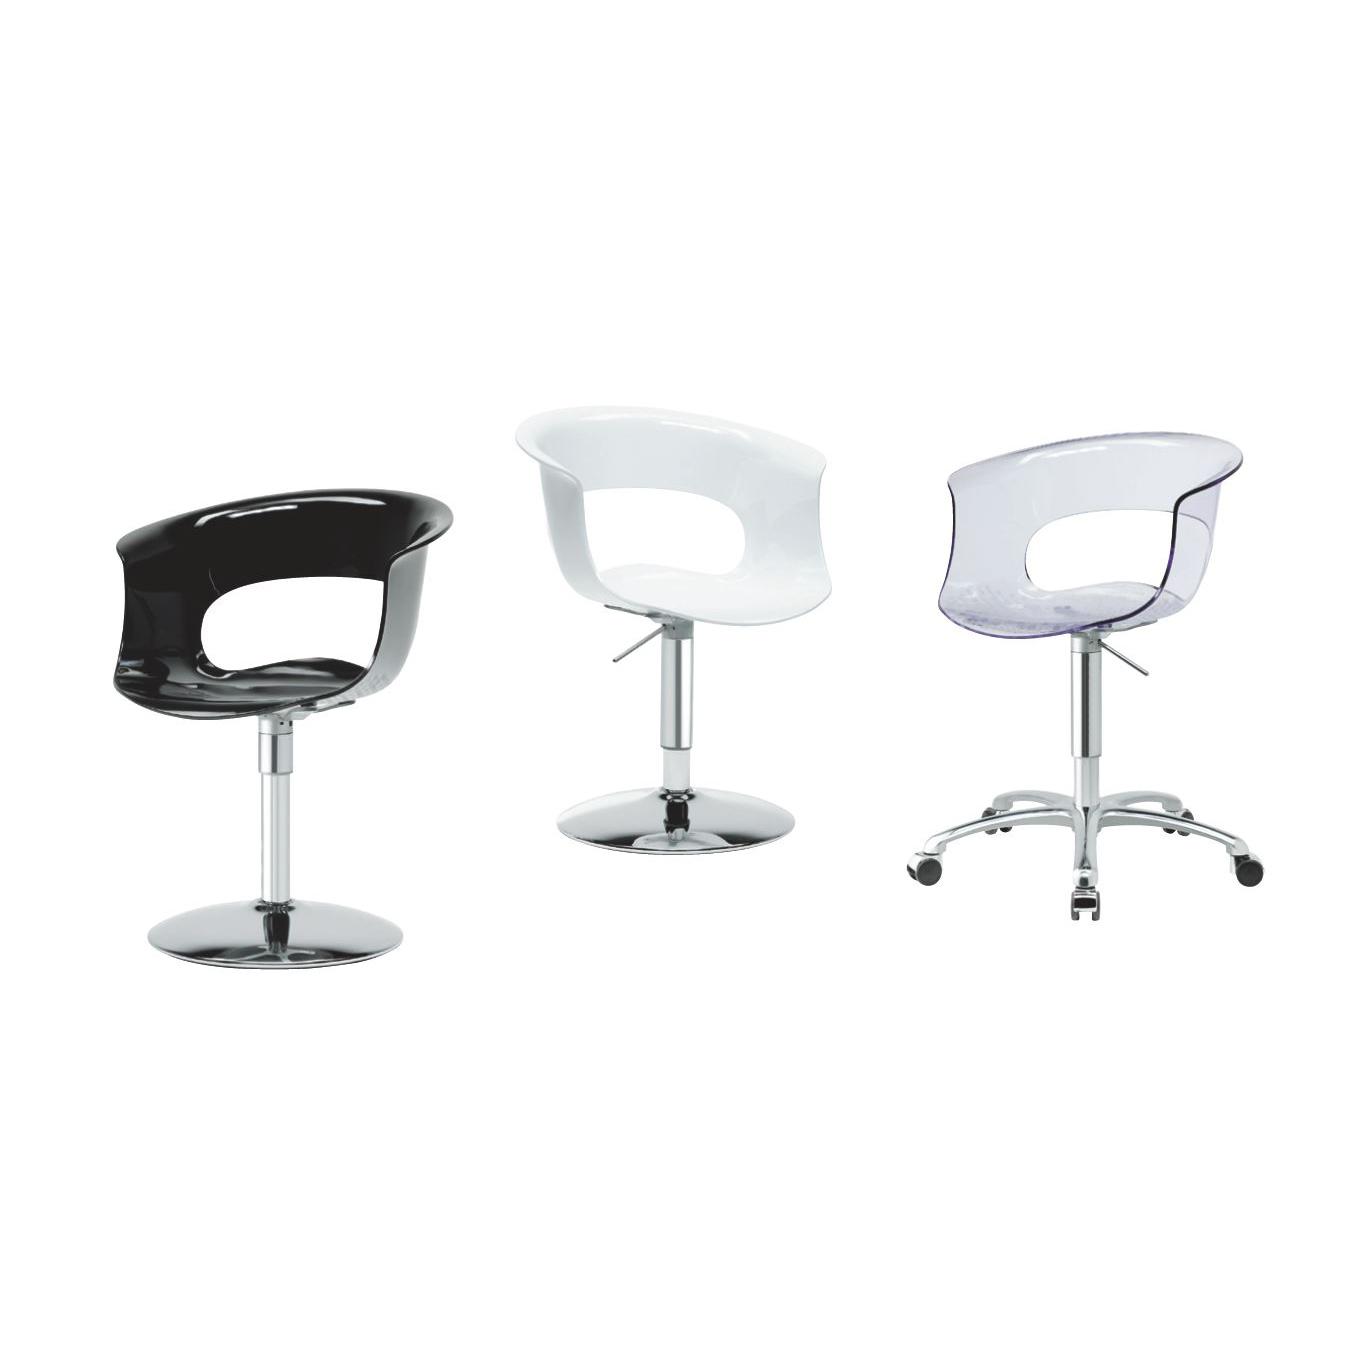 Silla giratoria miss b oficce soluciones contract - Ruedas para sillas giratorias ...